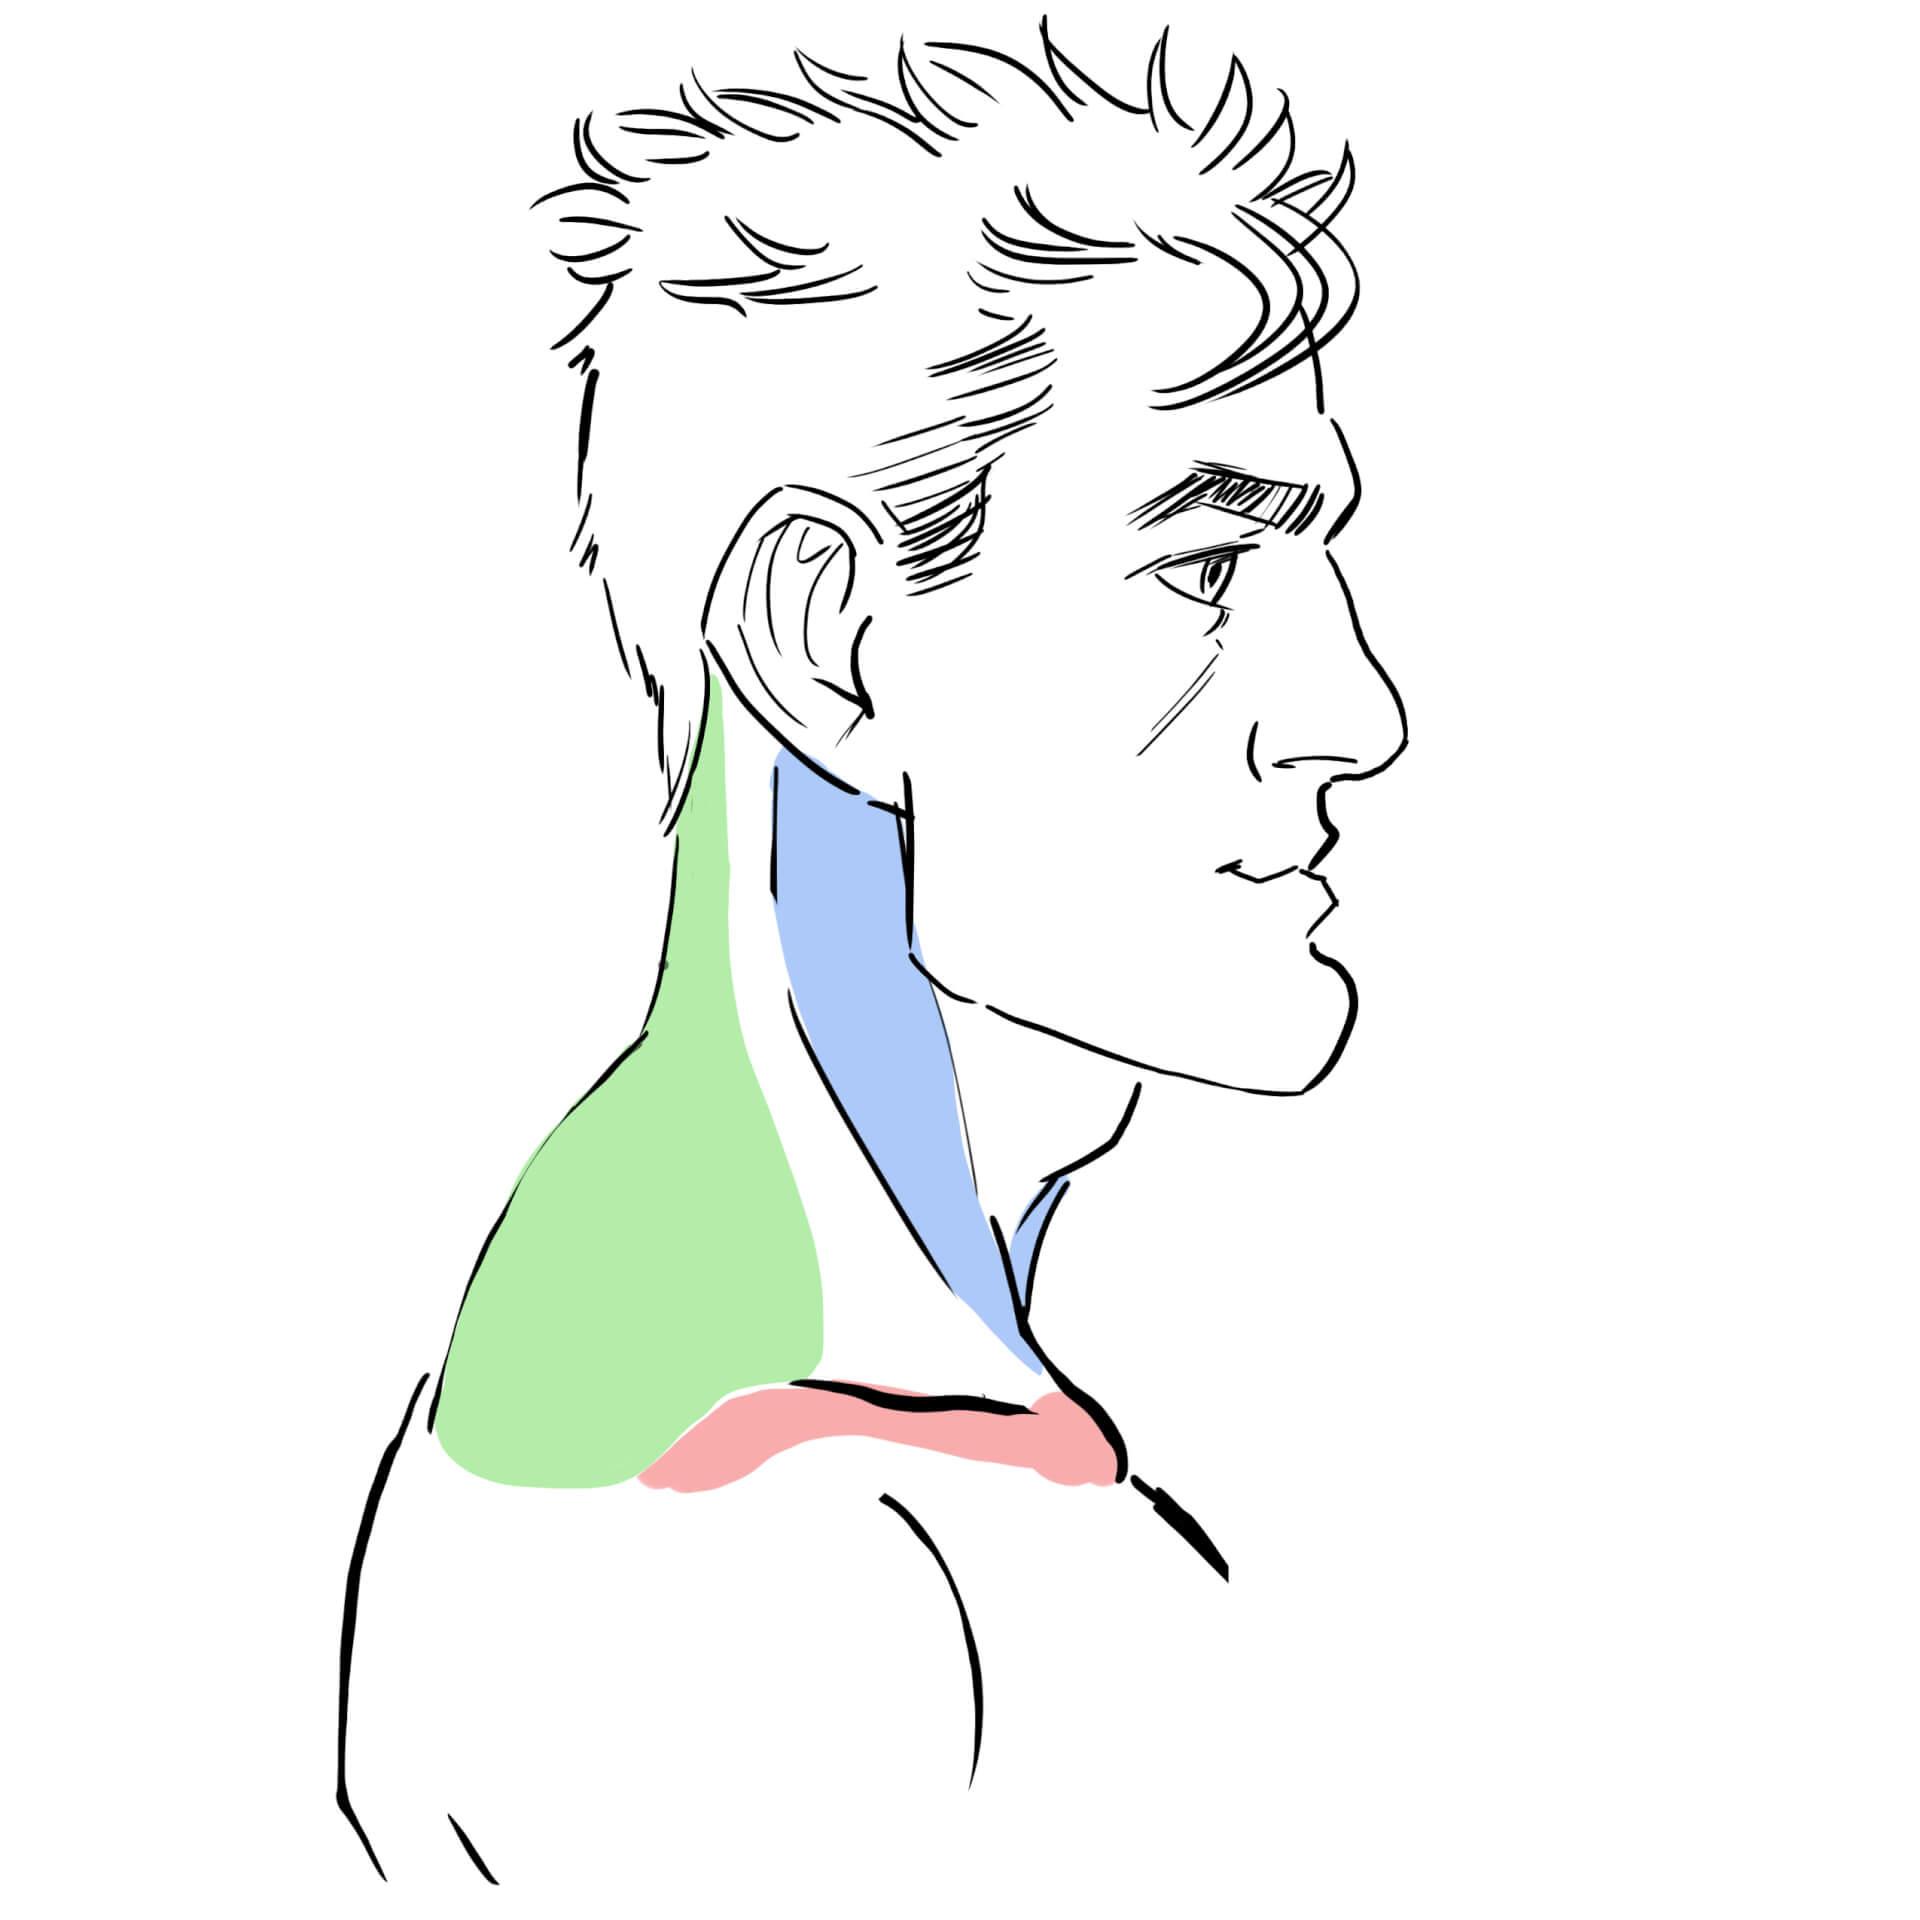 manga comic gameart hals nacken muskulatur nacken zeichnen lernen online kurs